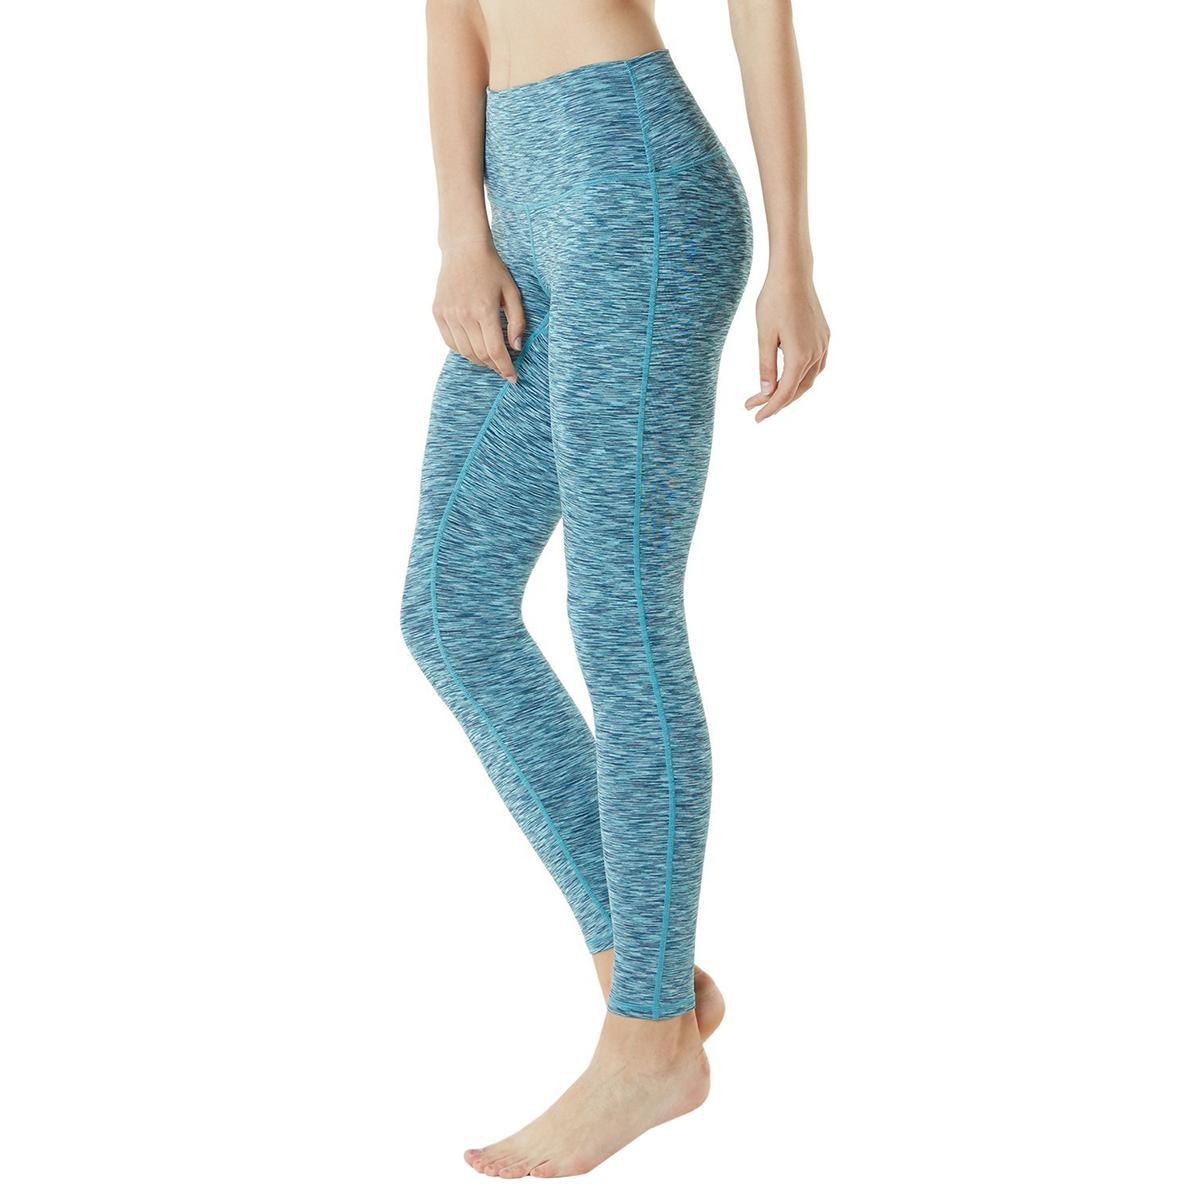 thumbnail 75 - TSLA Tesla FYP42 Women's High-Waisted Ultra-Stretch Tummy Control Yoga Pants